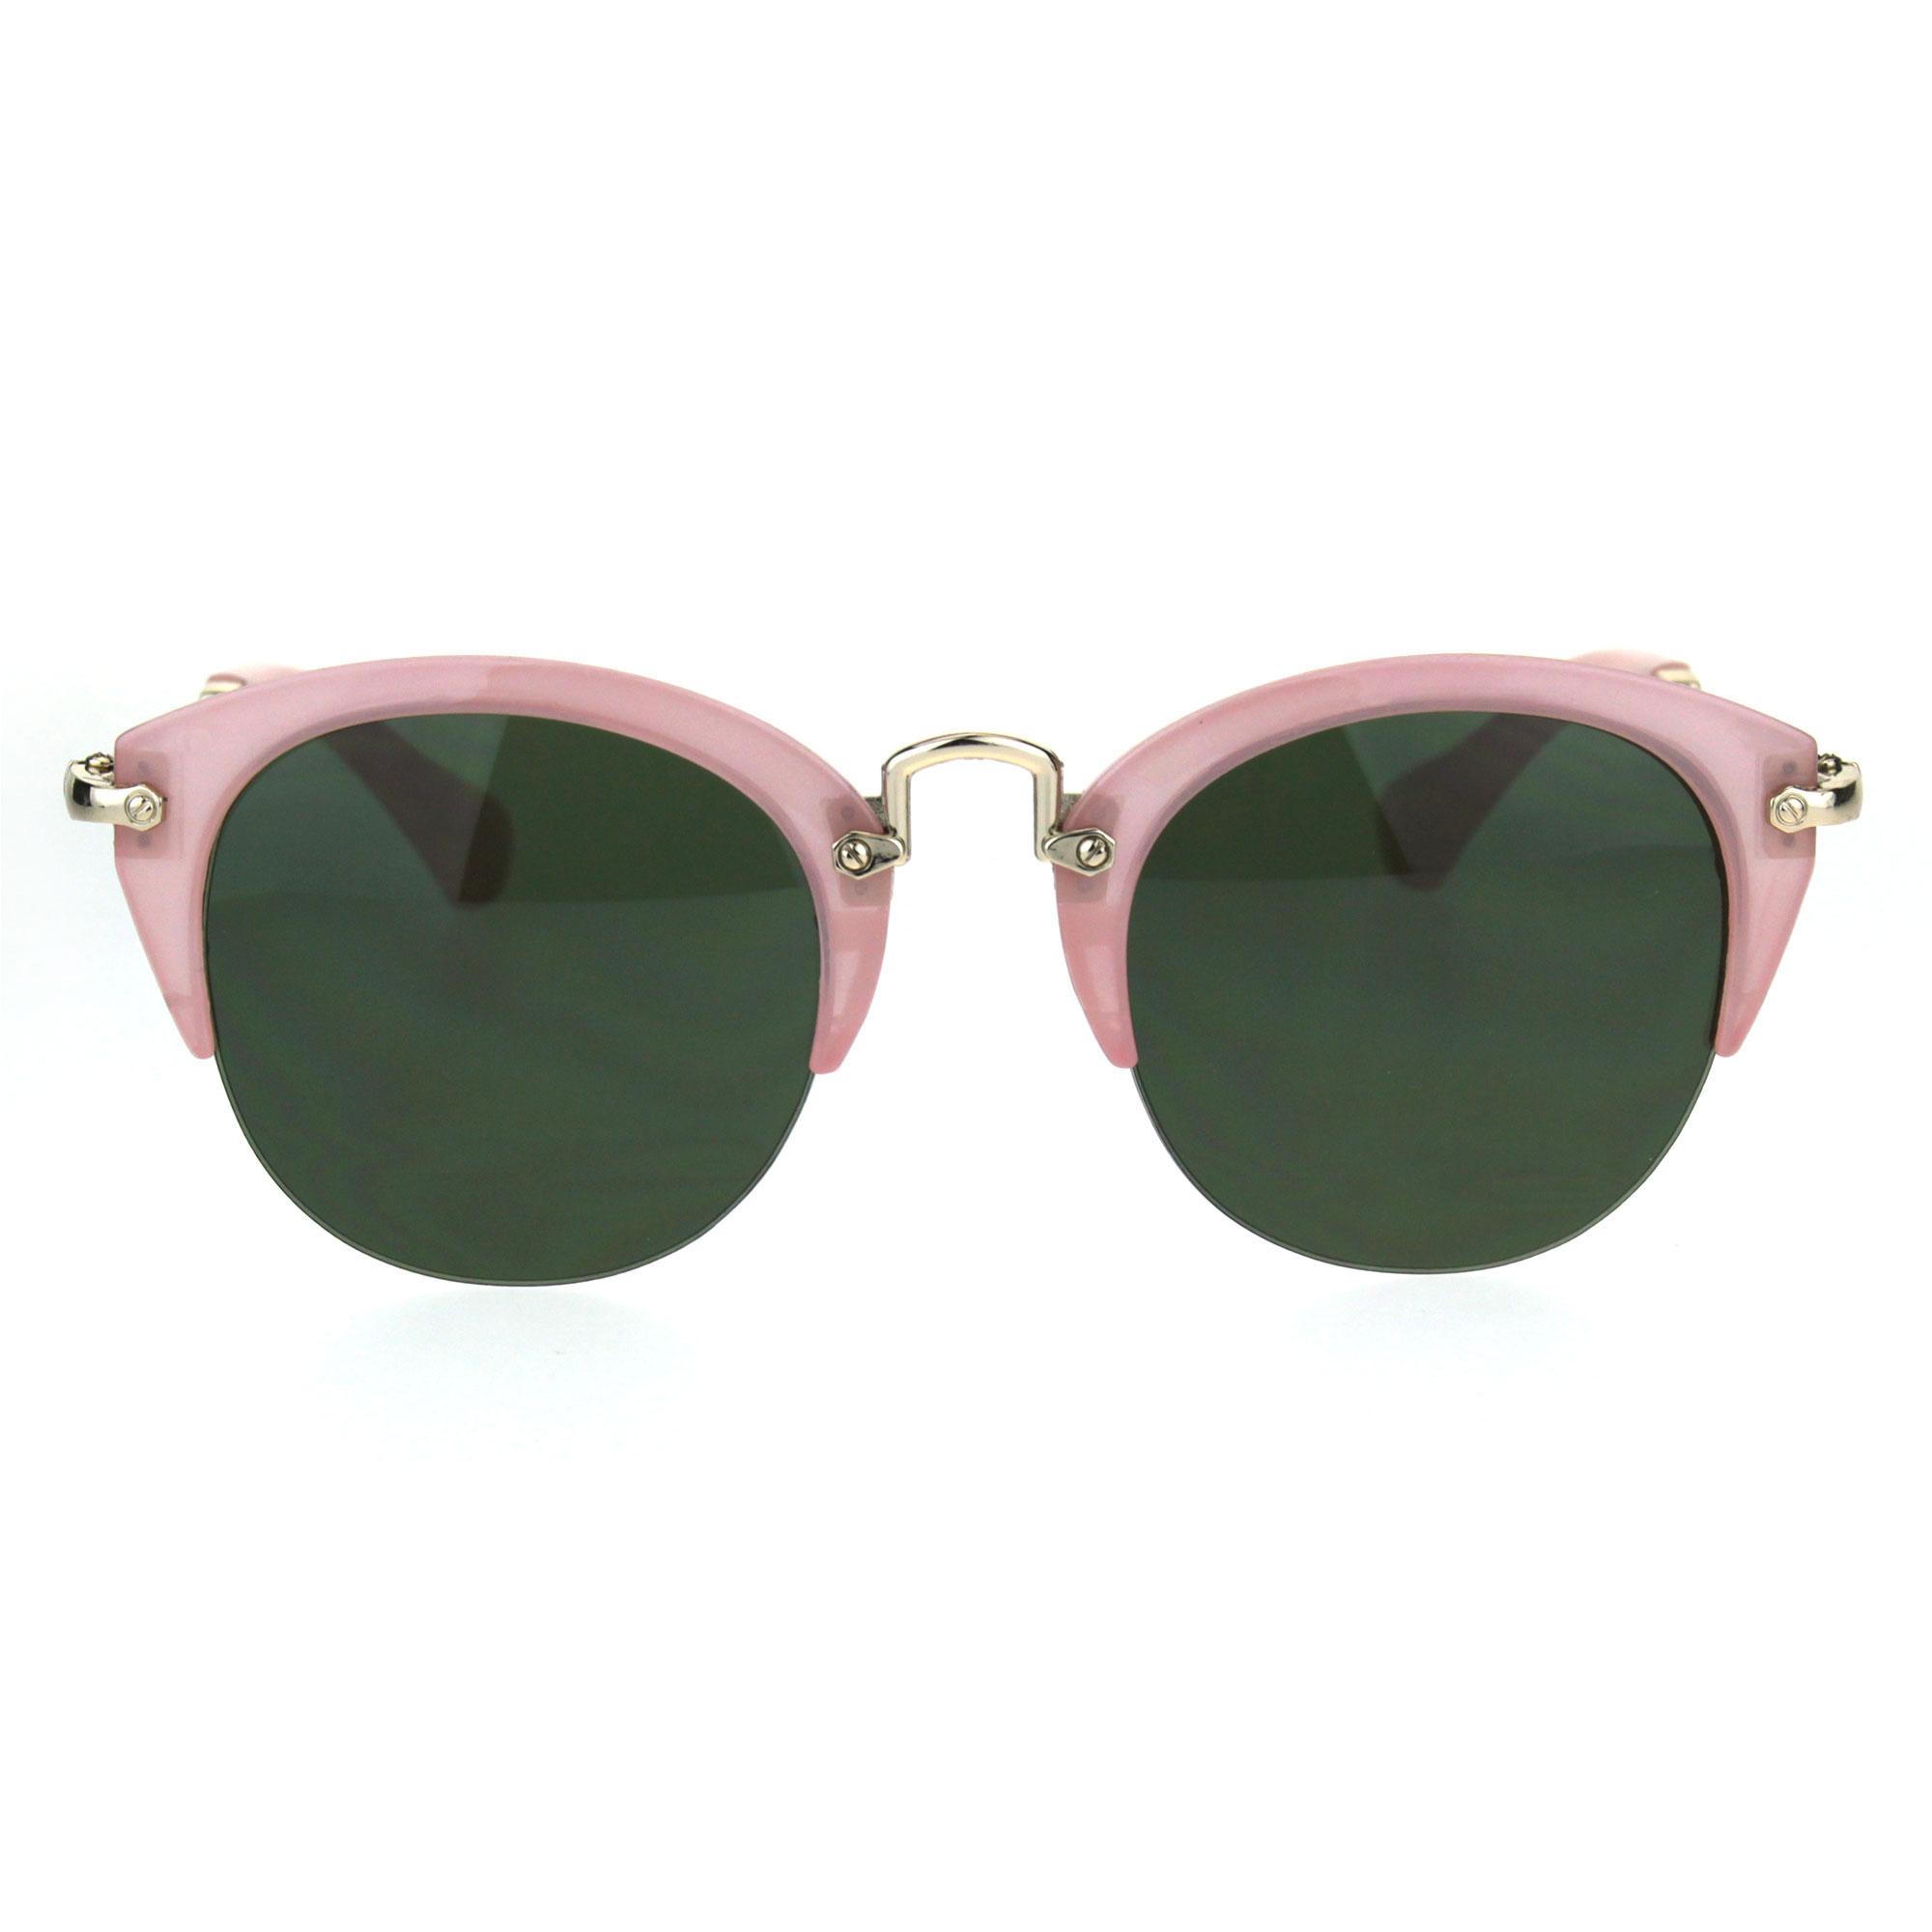 Womens Half Rim Cat Eye Gothic Fashion Retro Vintage Sunglasses